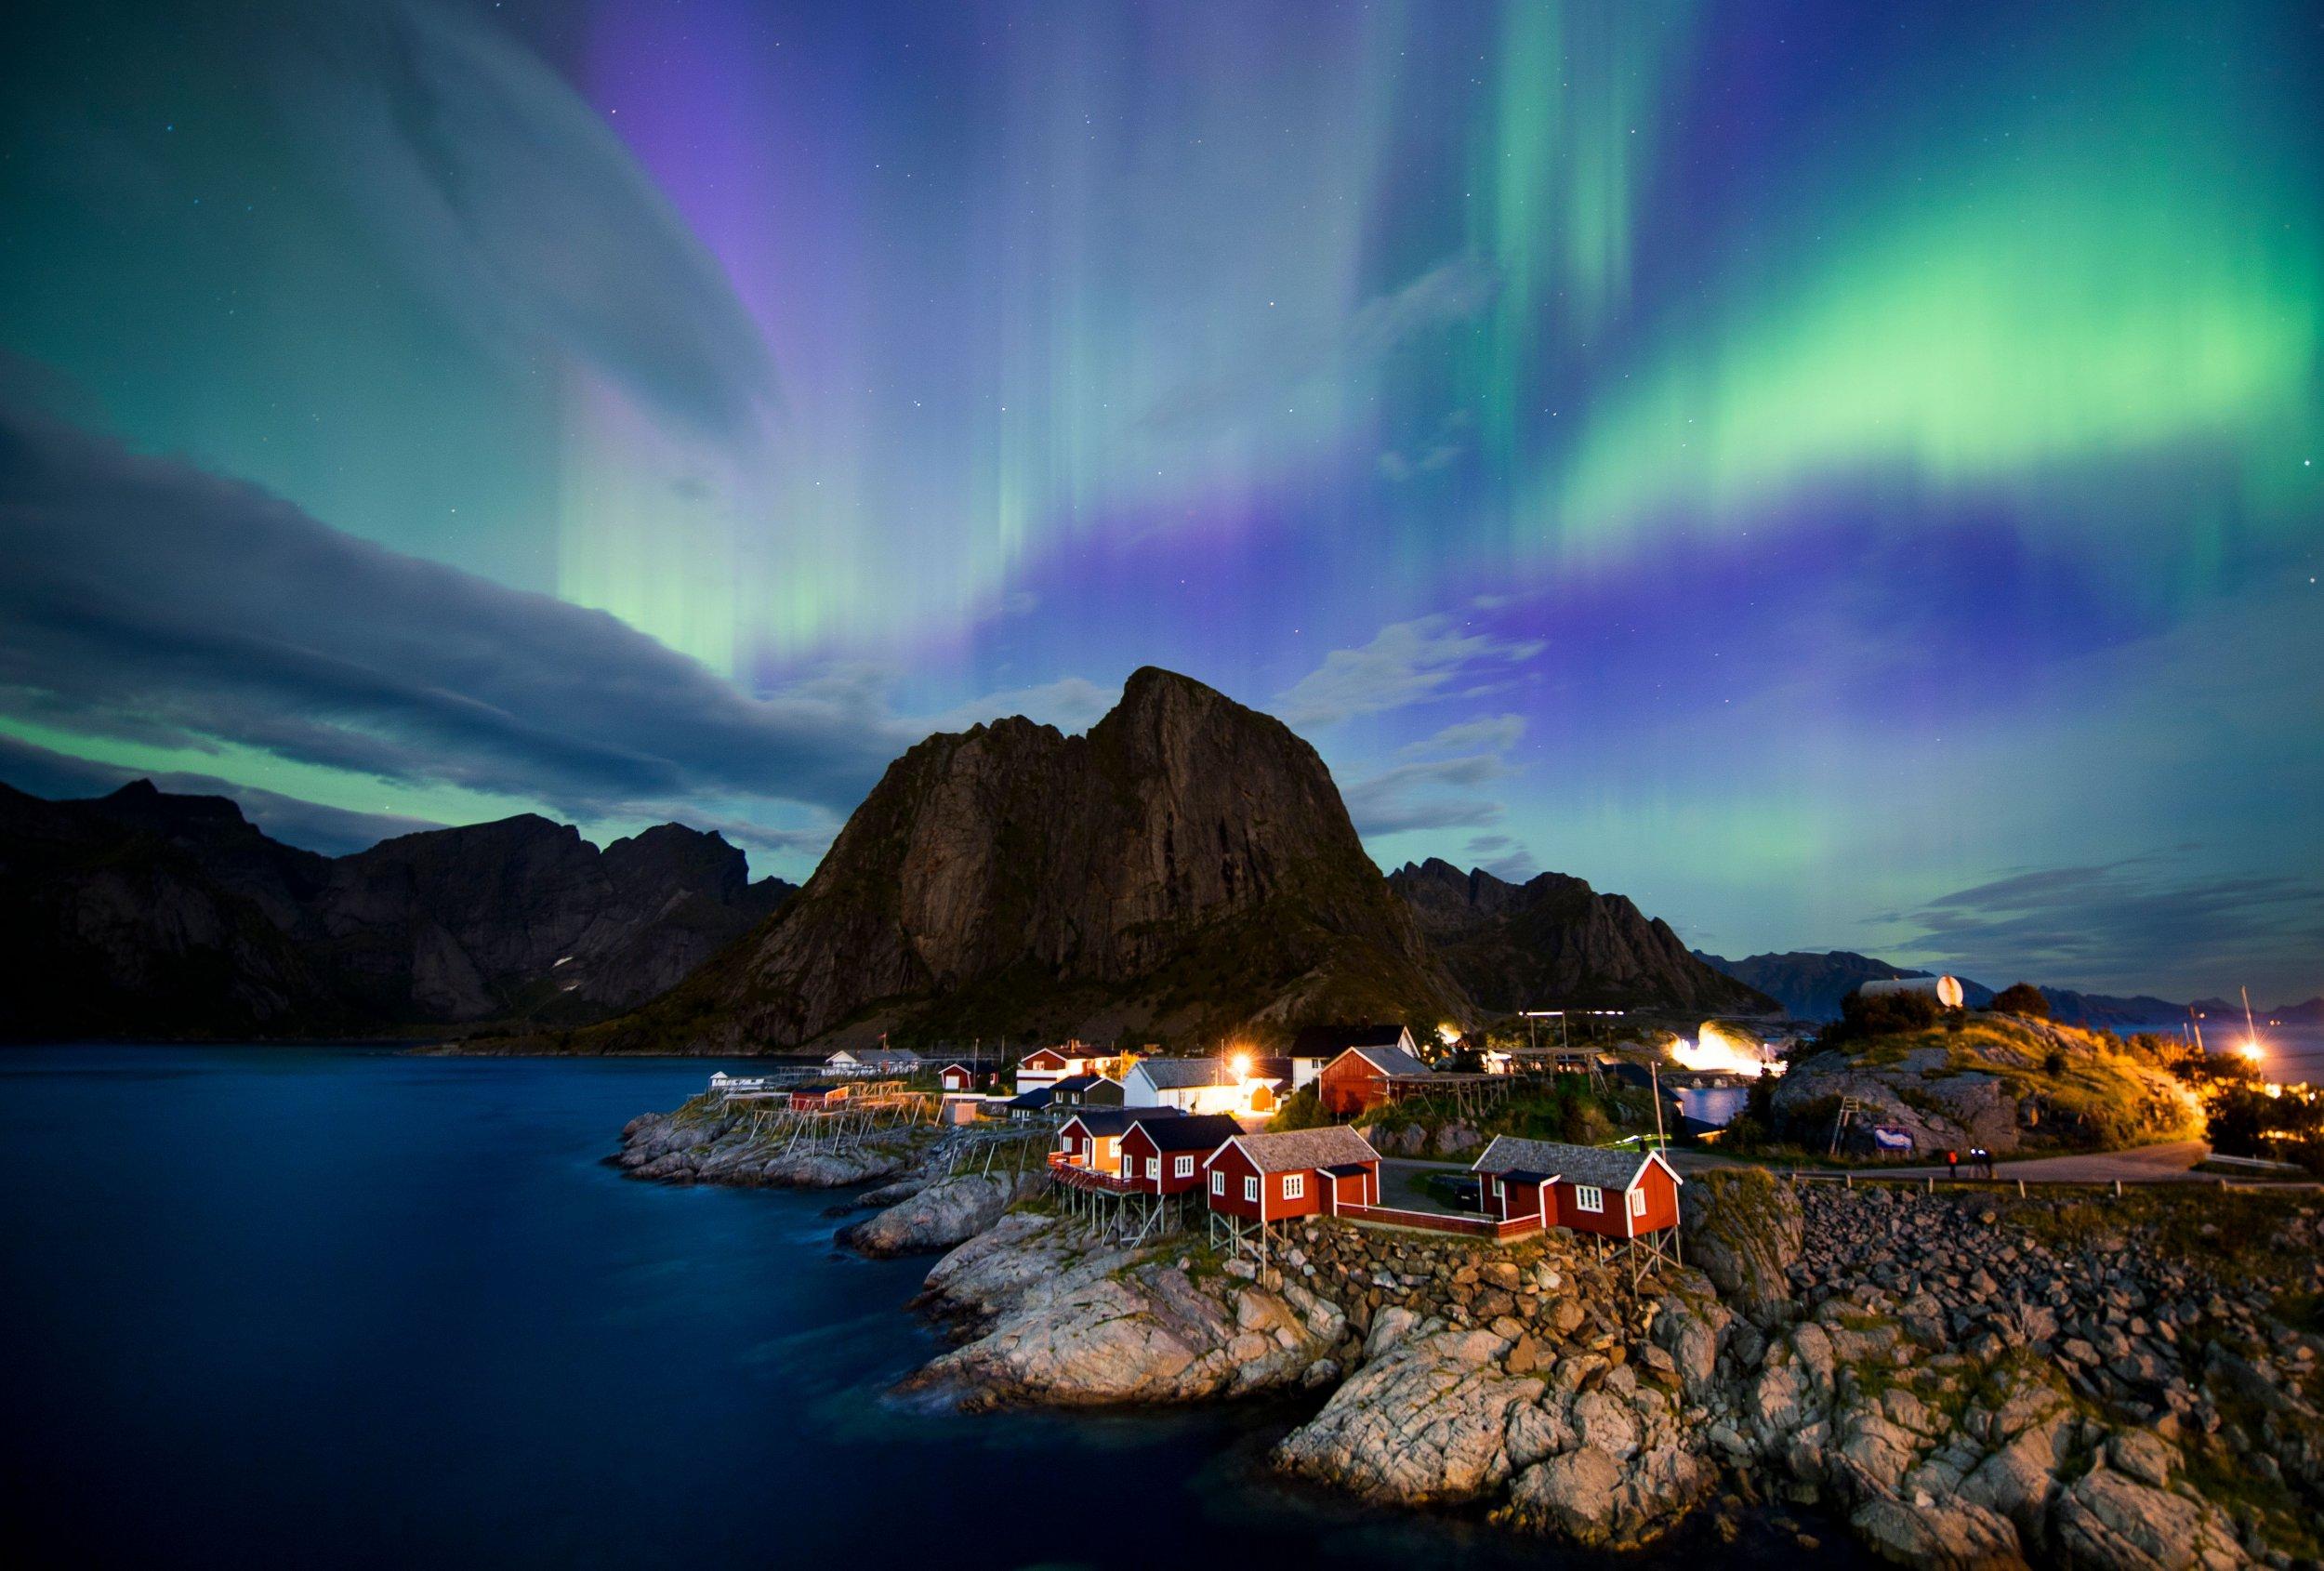 03_02_norway_northern_lights